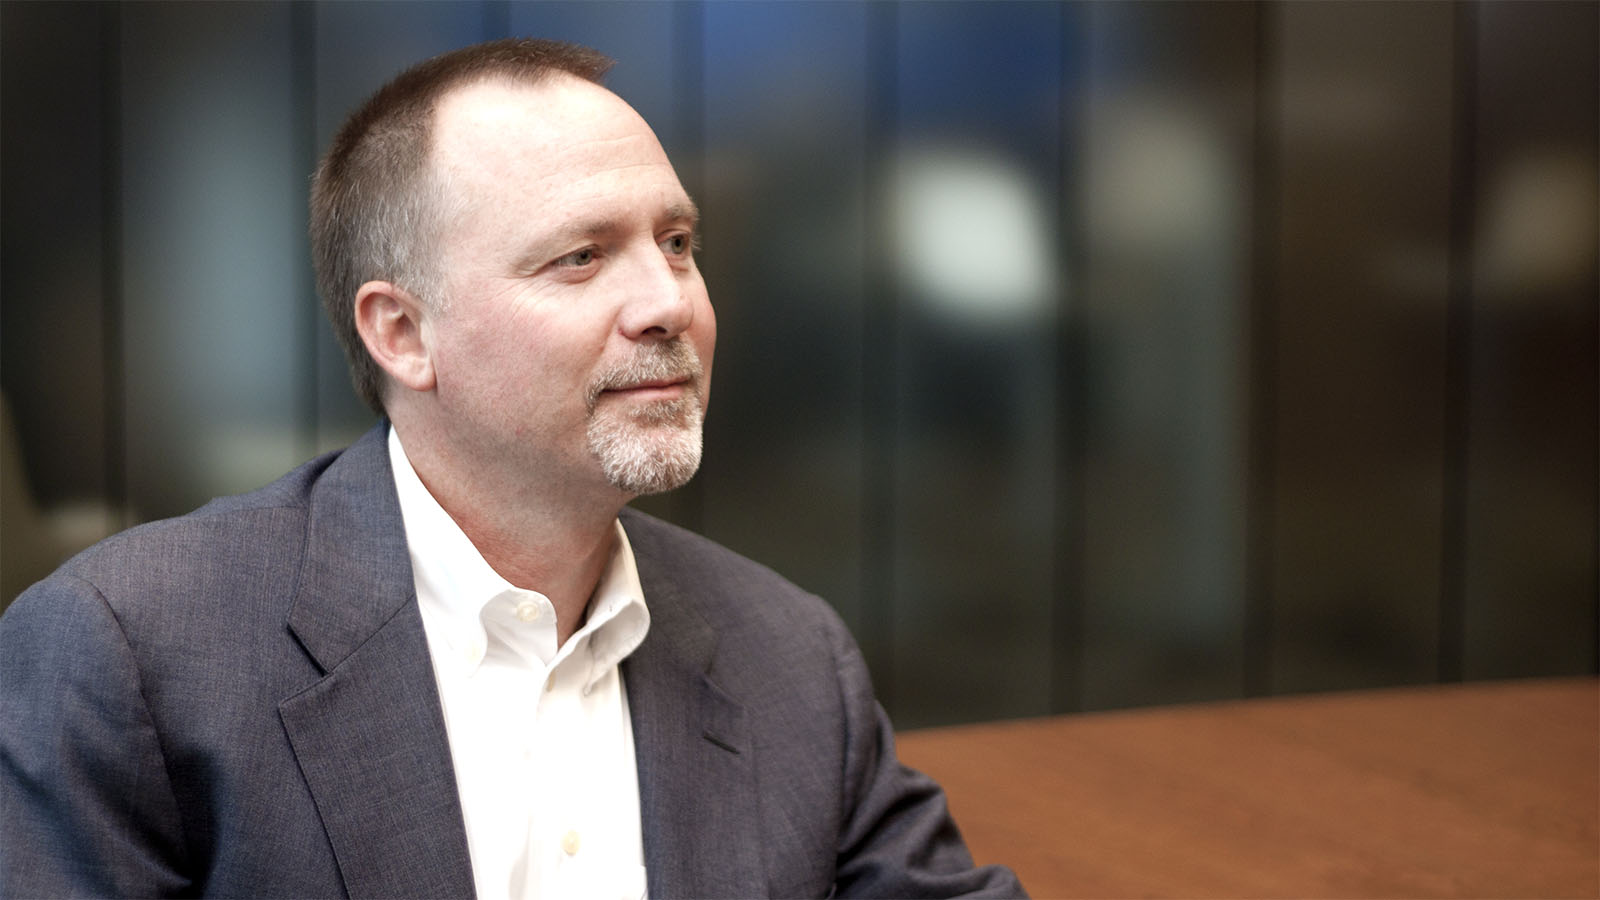 Lance Miller, PhD